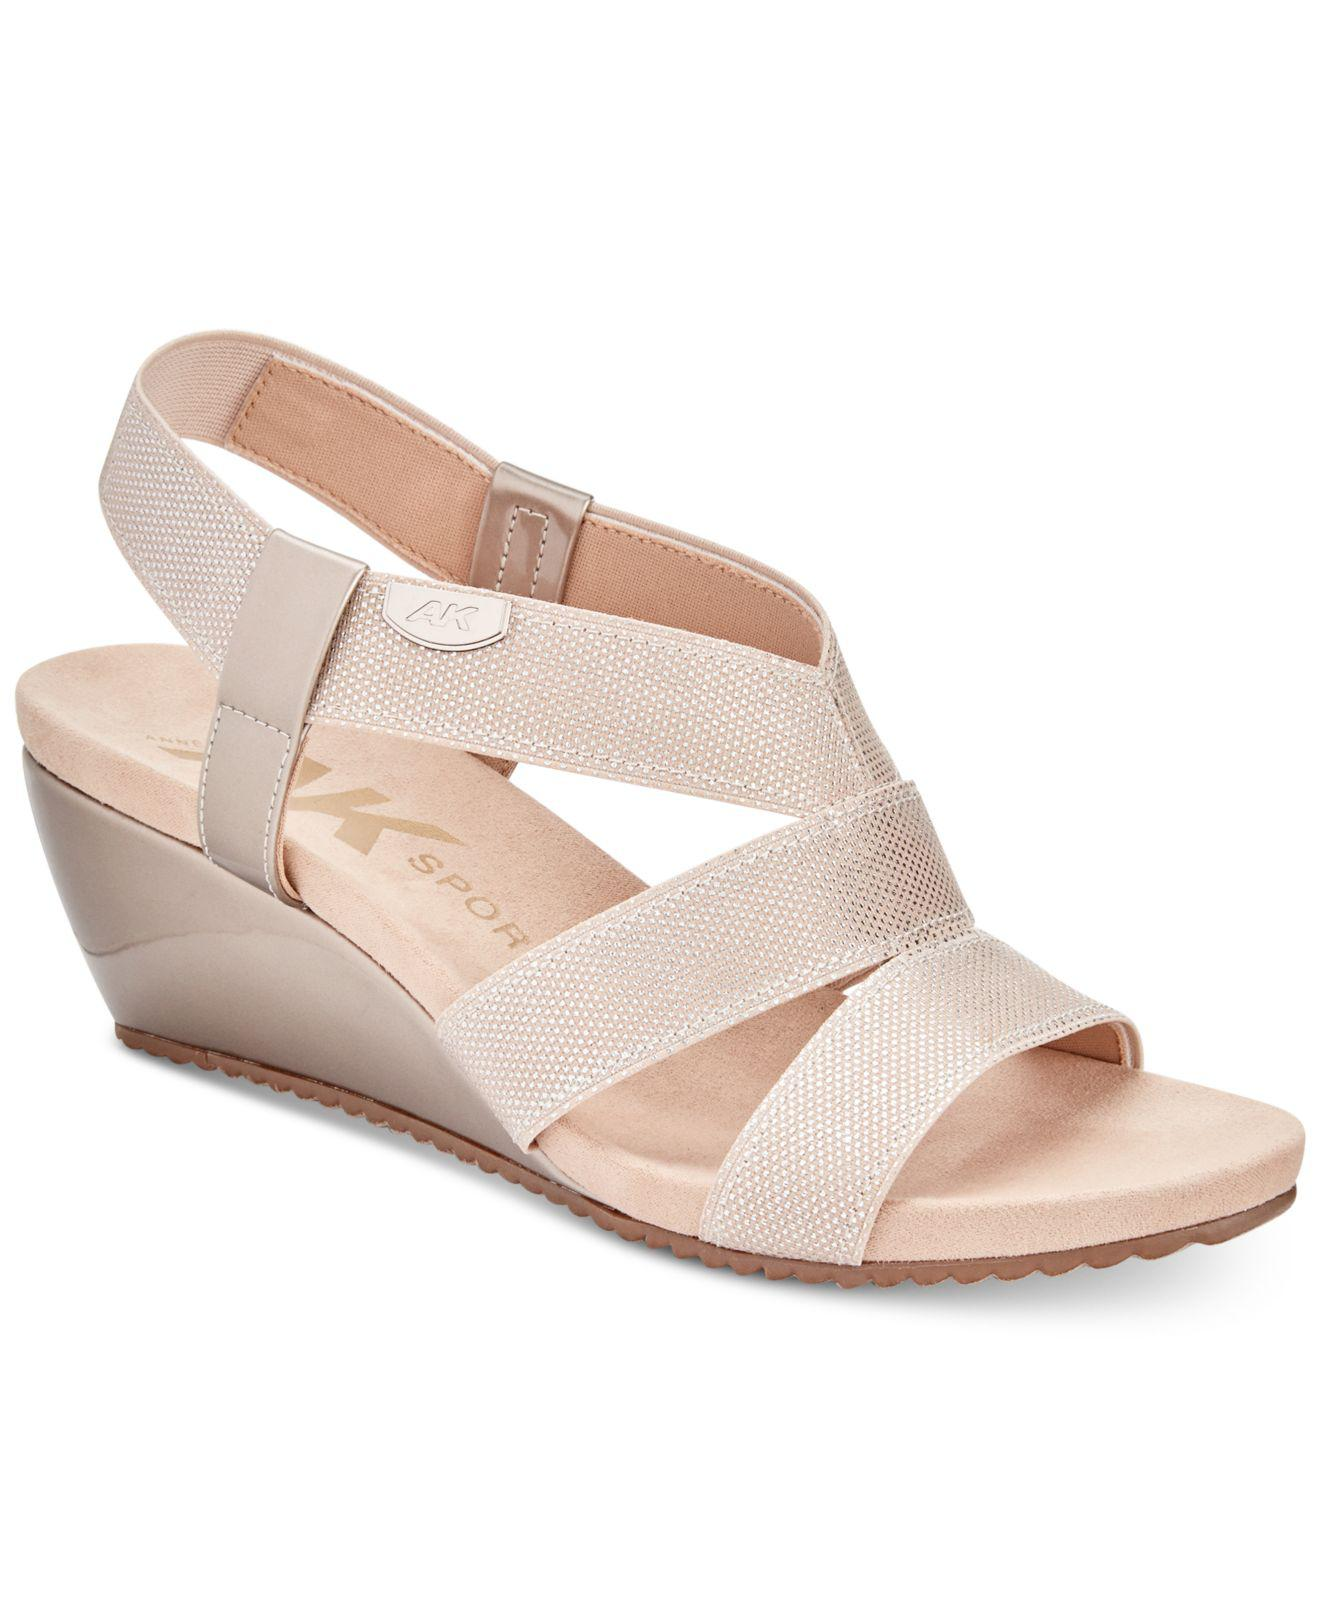 Anne Klein Cabrini Wedge Sandal(Women's) -Black/Black Elastic Cheap Sale Excellent nBPGyJu